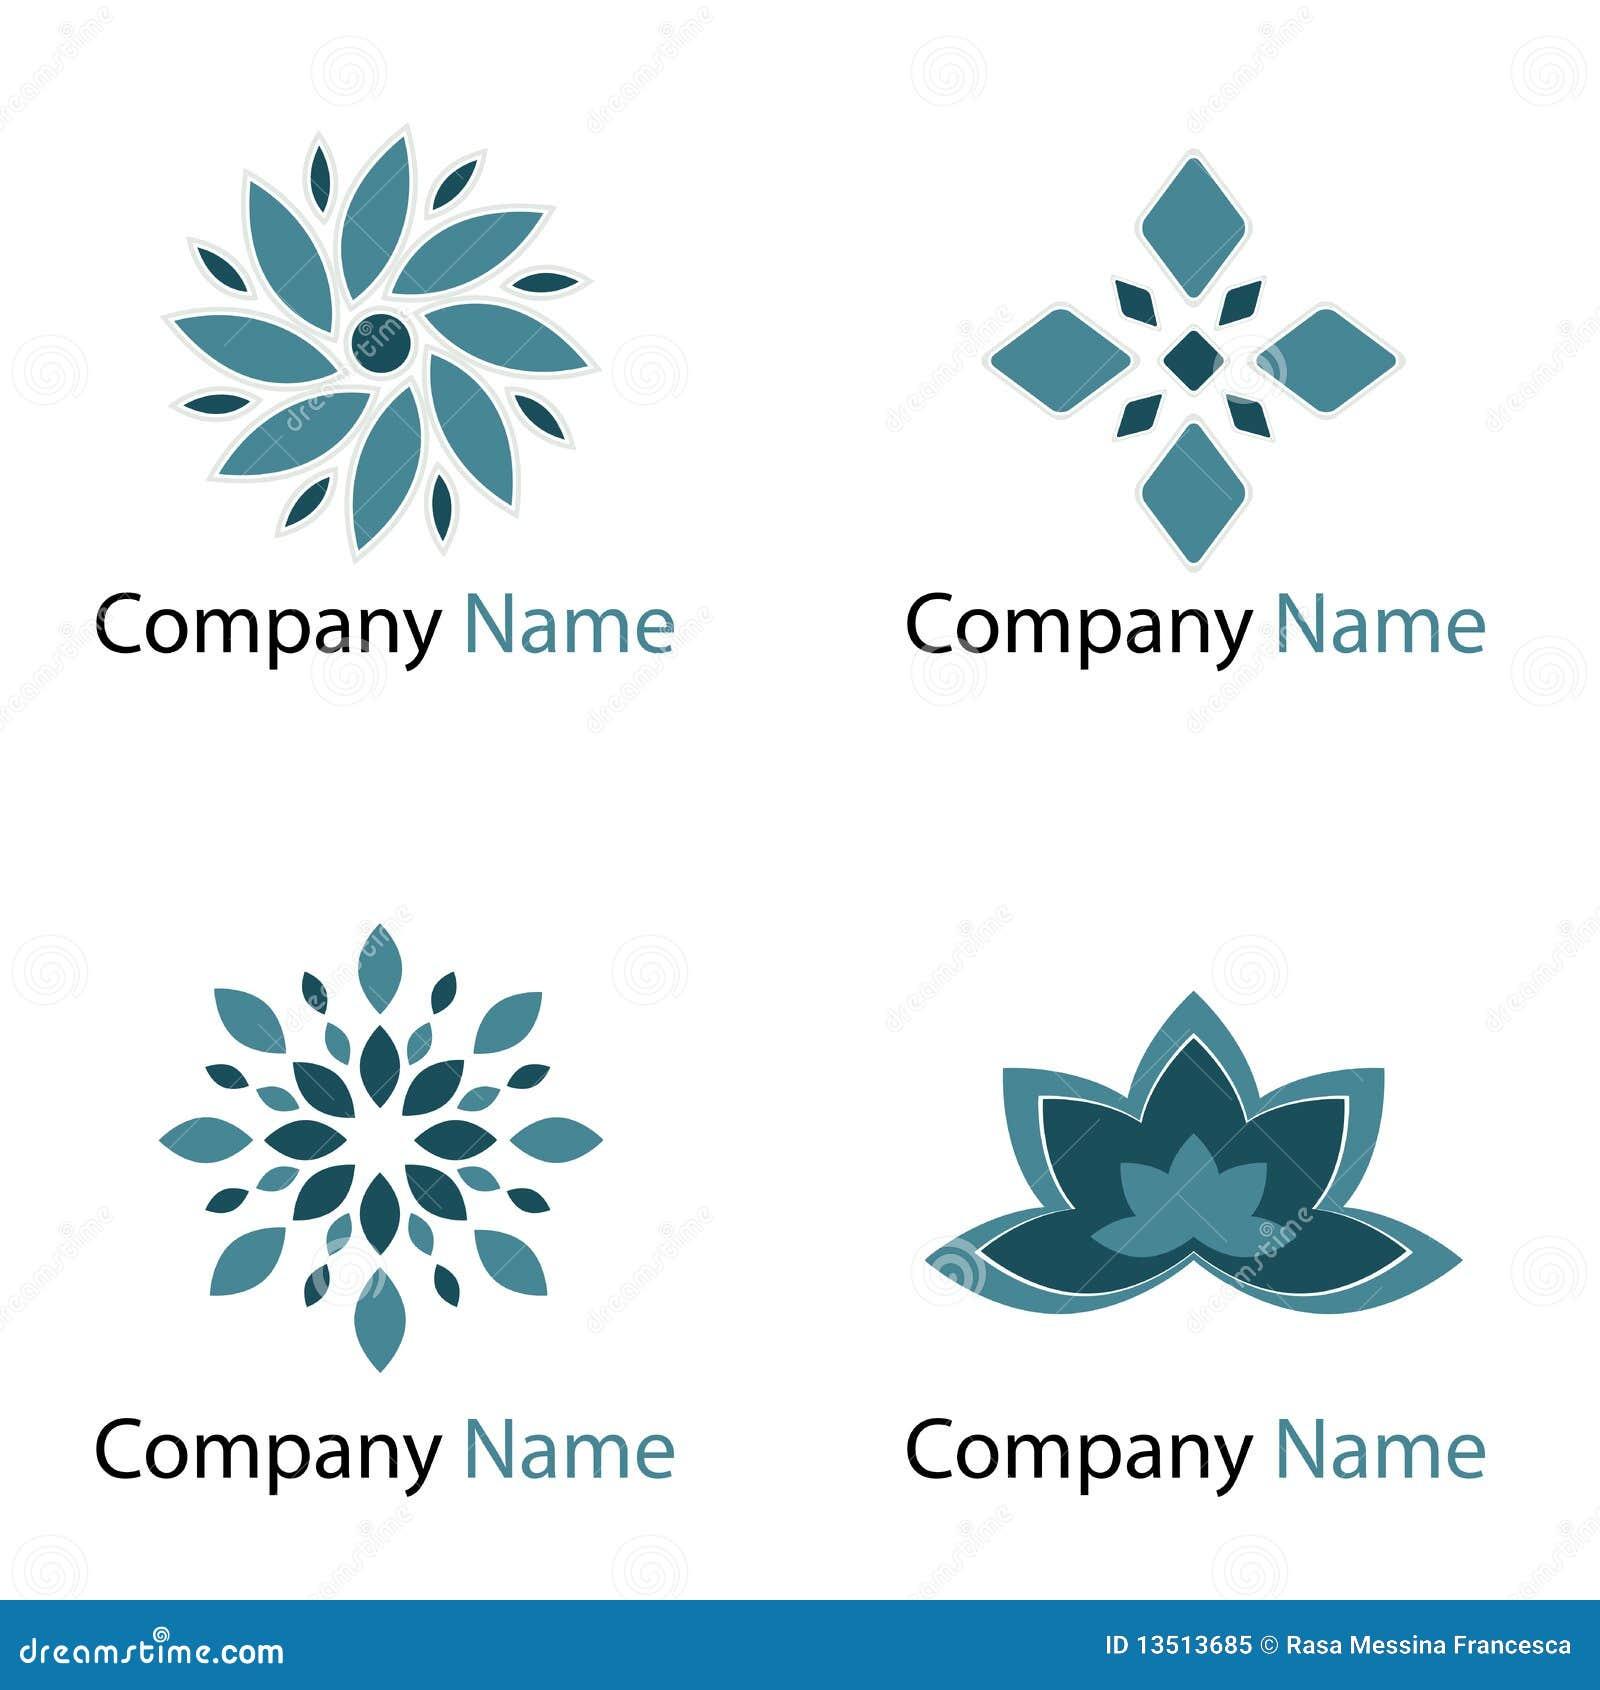 Flowers logos - blue